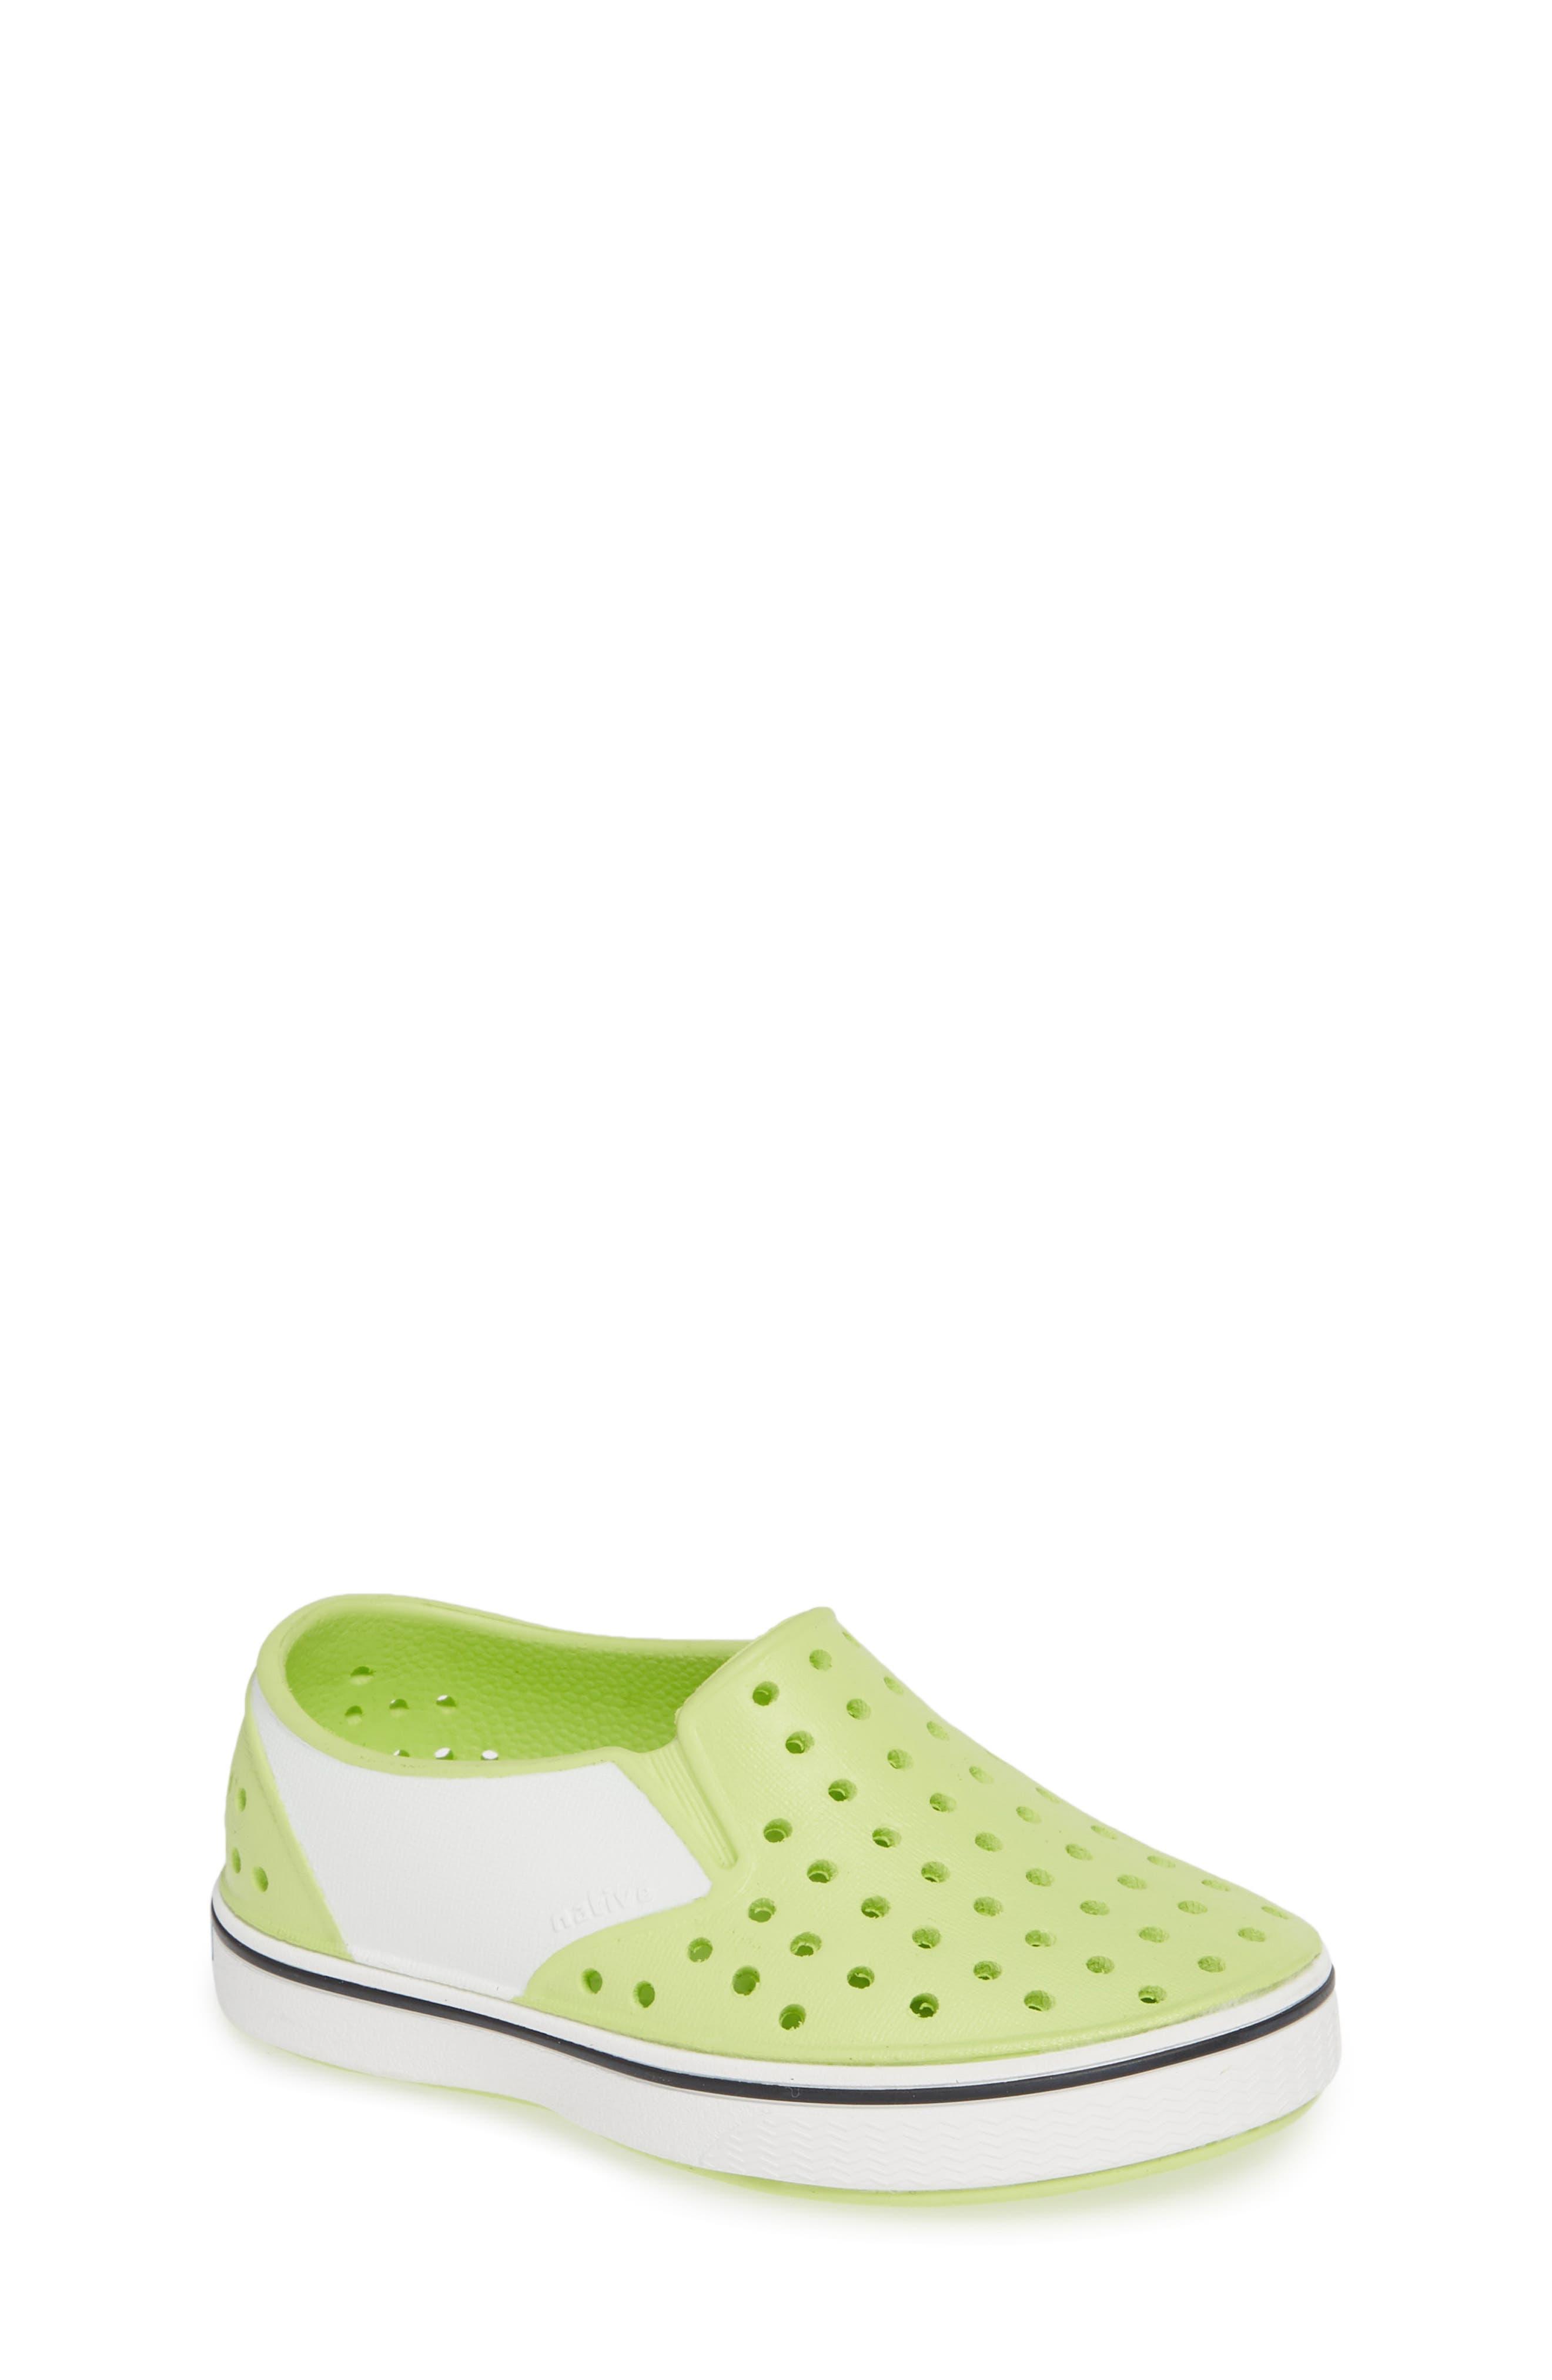 Miles Colorblock Slip-On Sneaker,                         Main,                         color, SUNNY GREEN/ SHELL WHITE